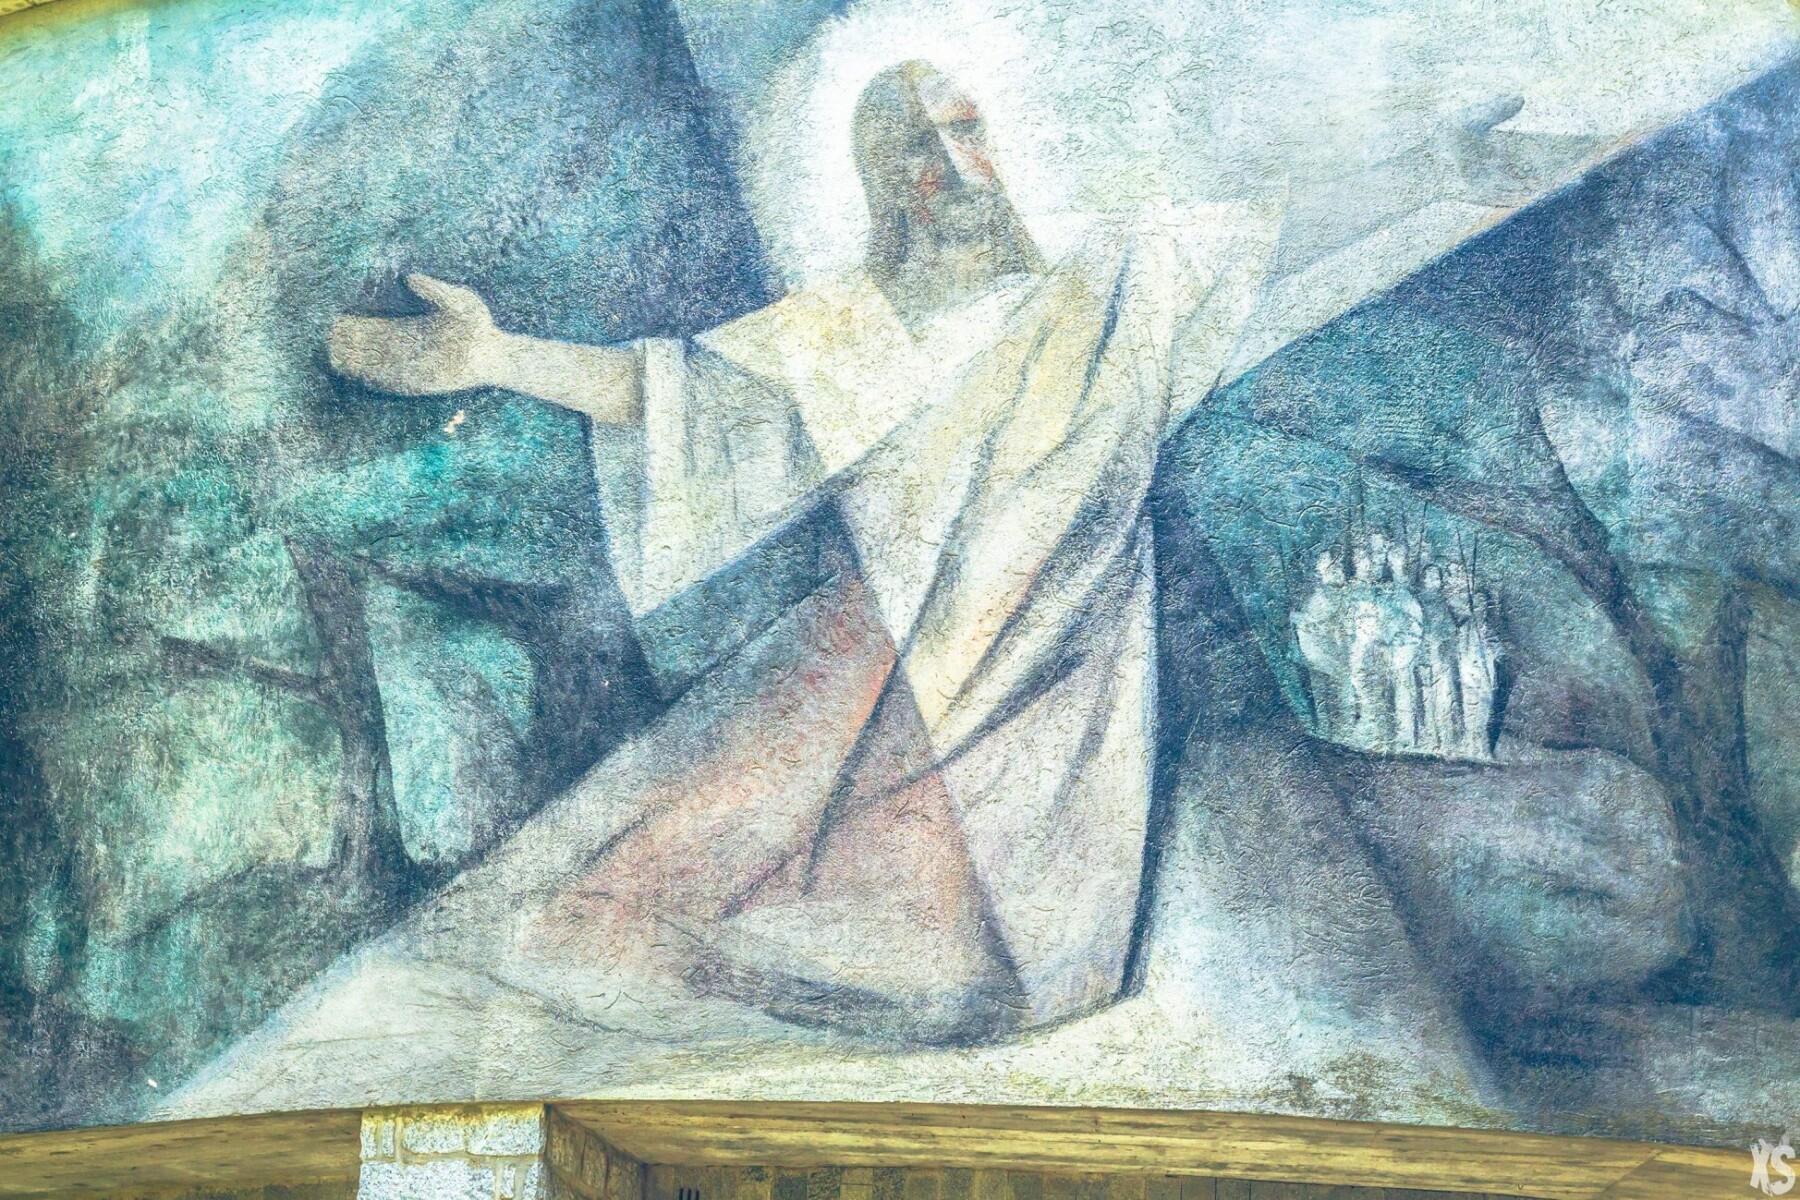 sanctuaire-bertha-gifford-26